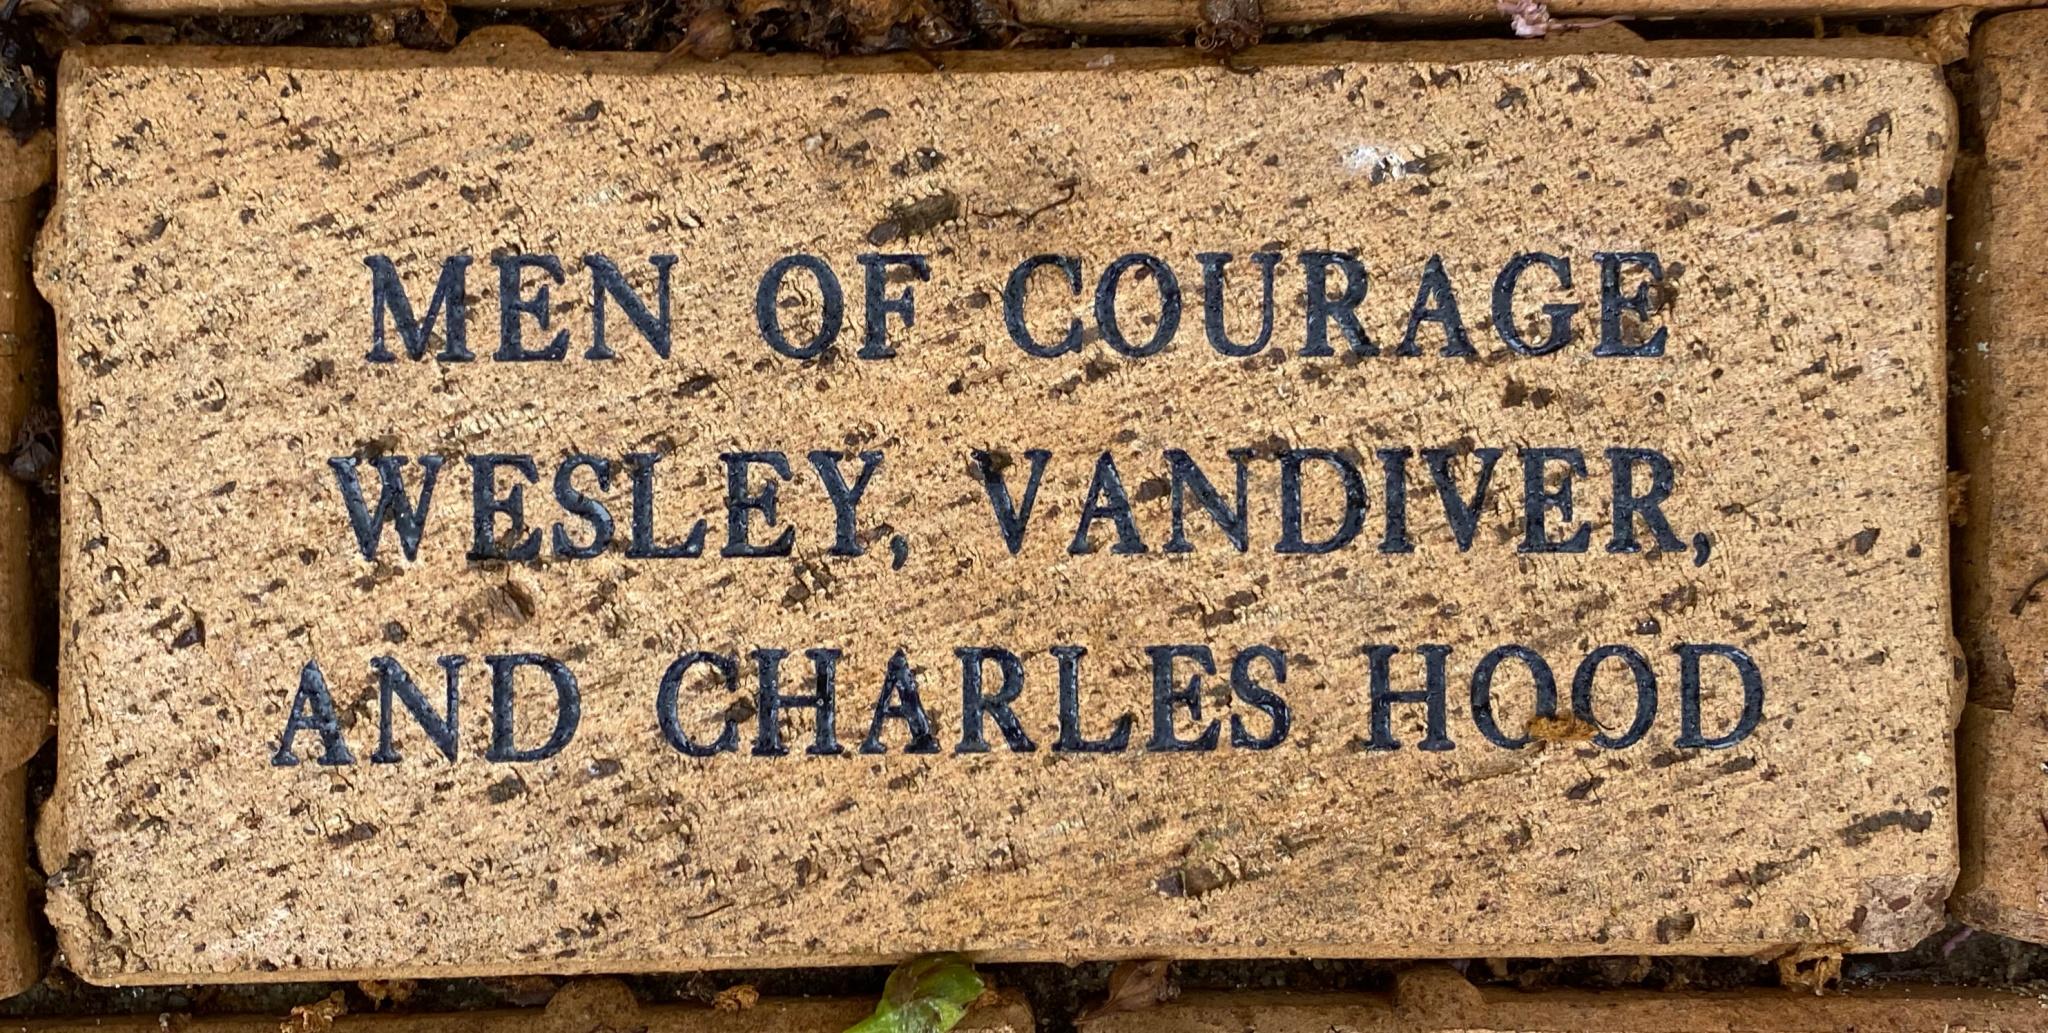 MEN OF COURAGE WESLEY, VANDIVER,  AND CHARLES HOOD